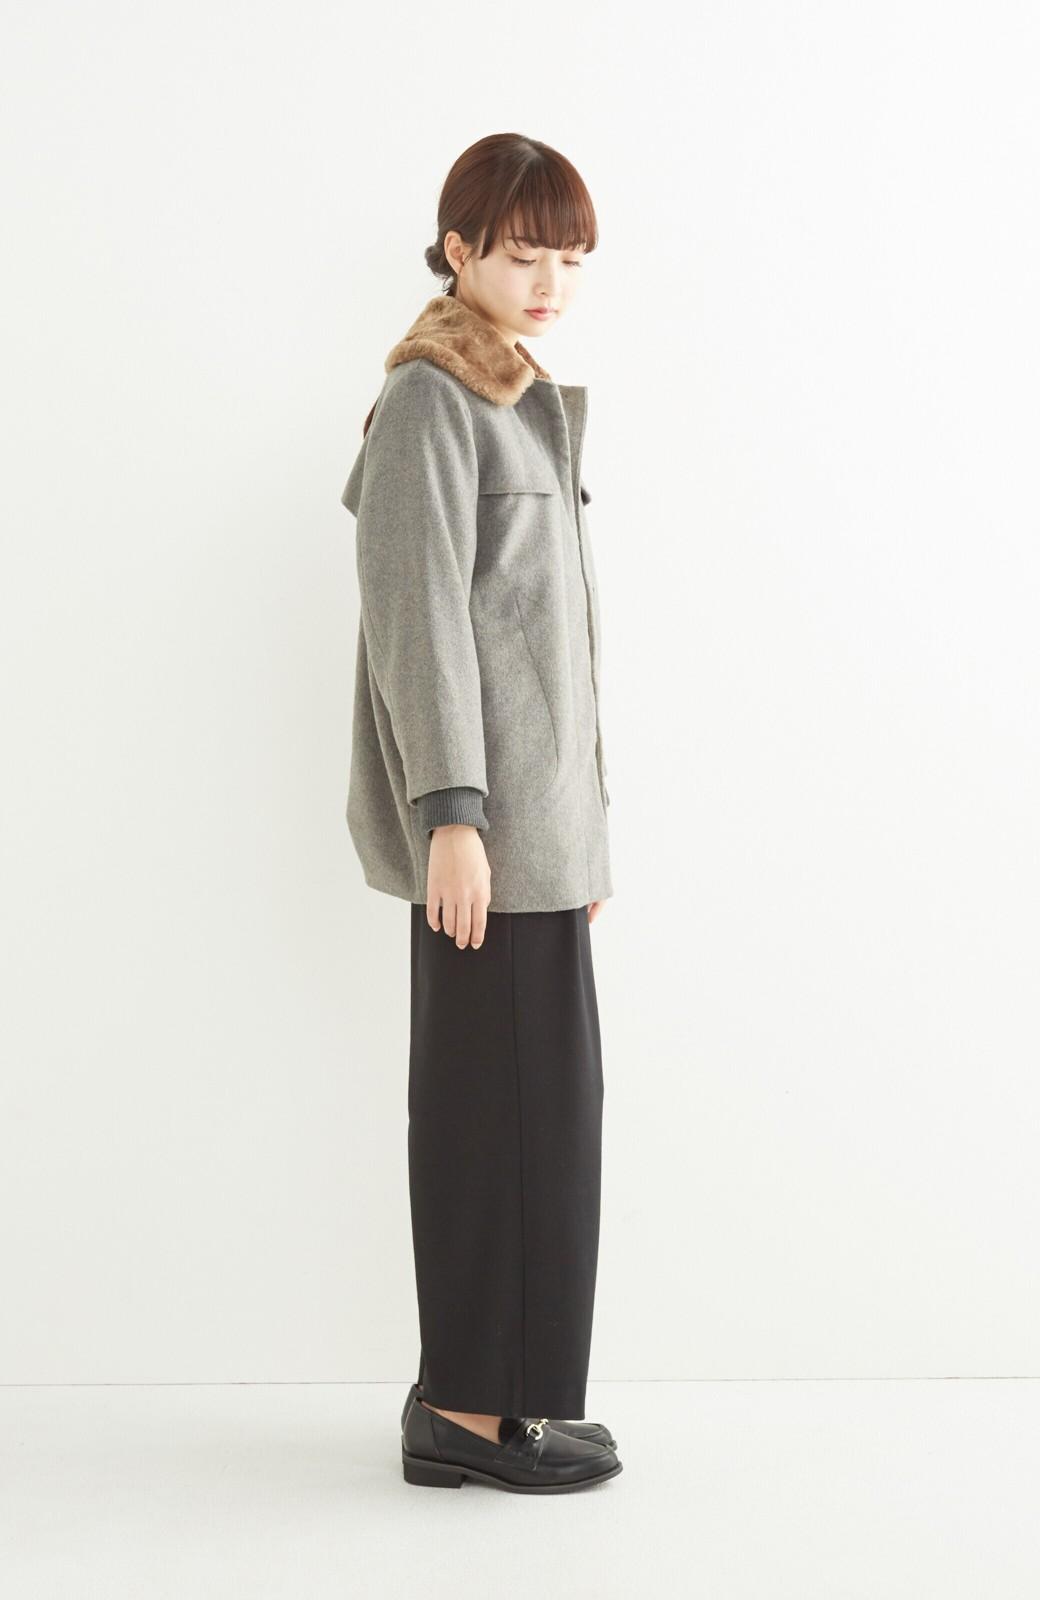 pilvee 取り外しフェイクファー衿付き ウール混のノーカラーコート <グレー>の商品写真9